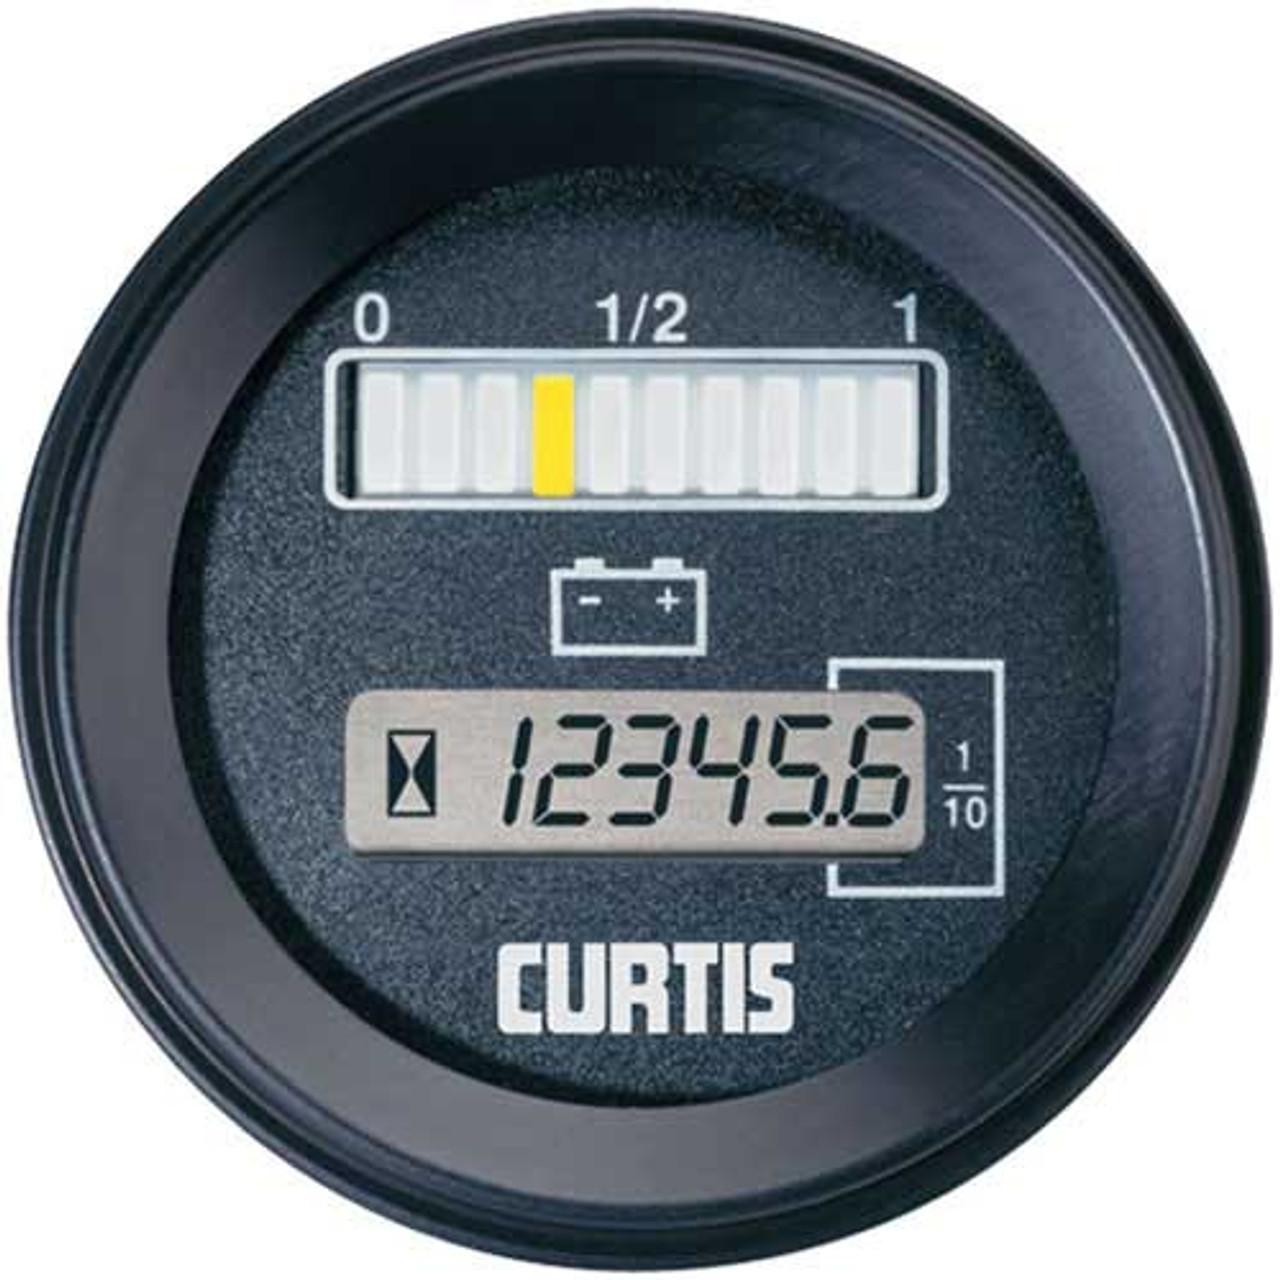 933-1C243648 Curtis Unigage 933 Model, BDI - Hour Gage - Lift Lockout